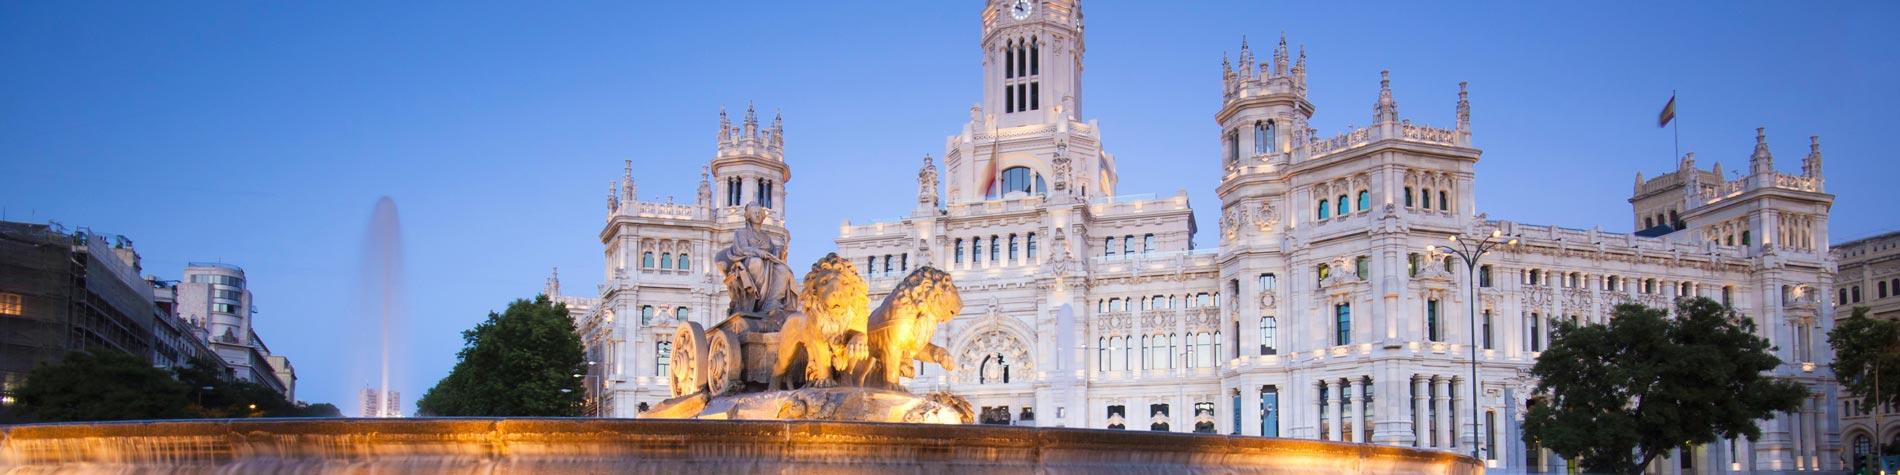 Billigflüge Nach Madrid Mad Ab 1498 Ryanaircom